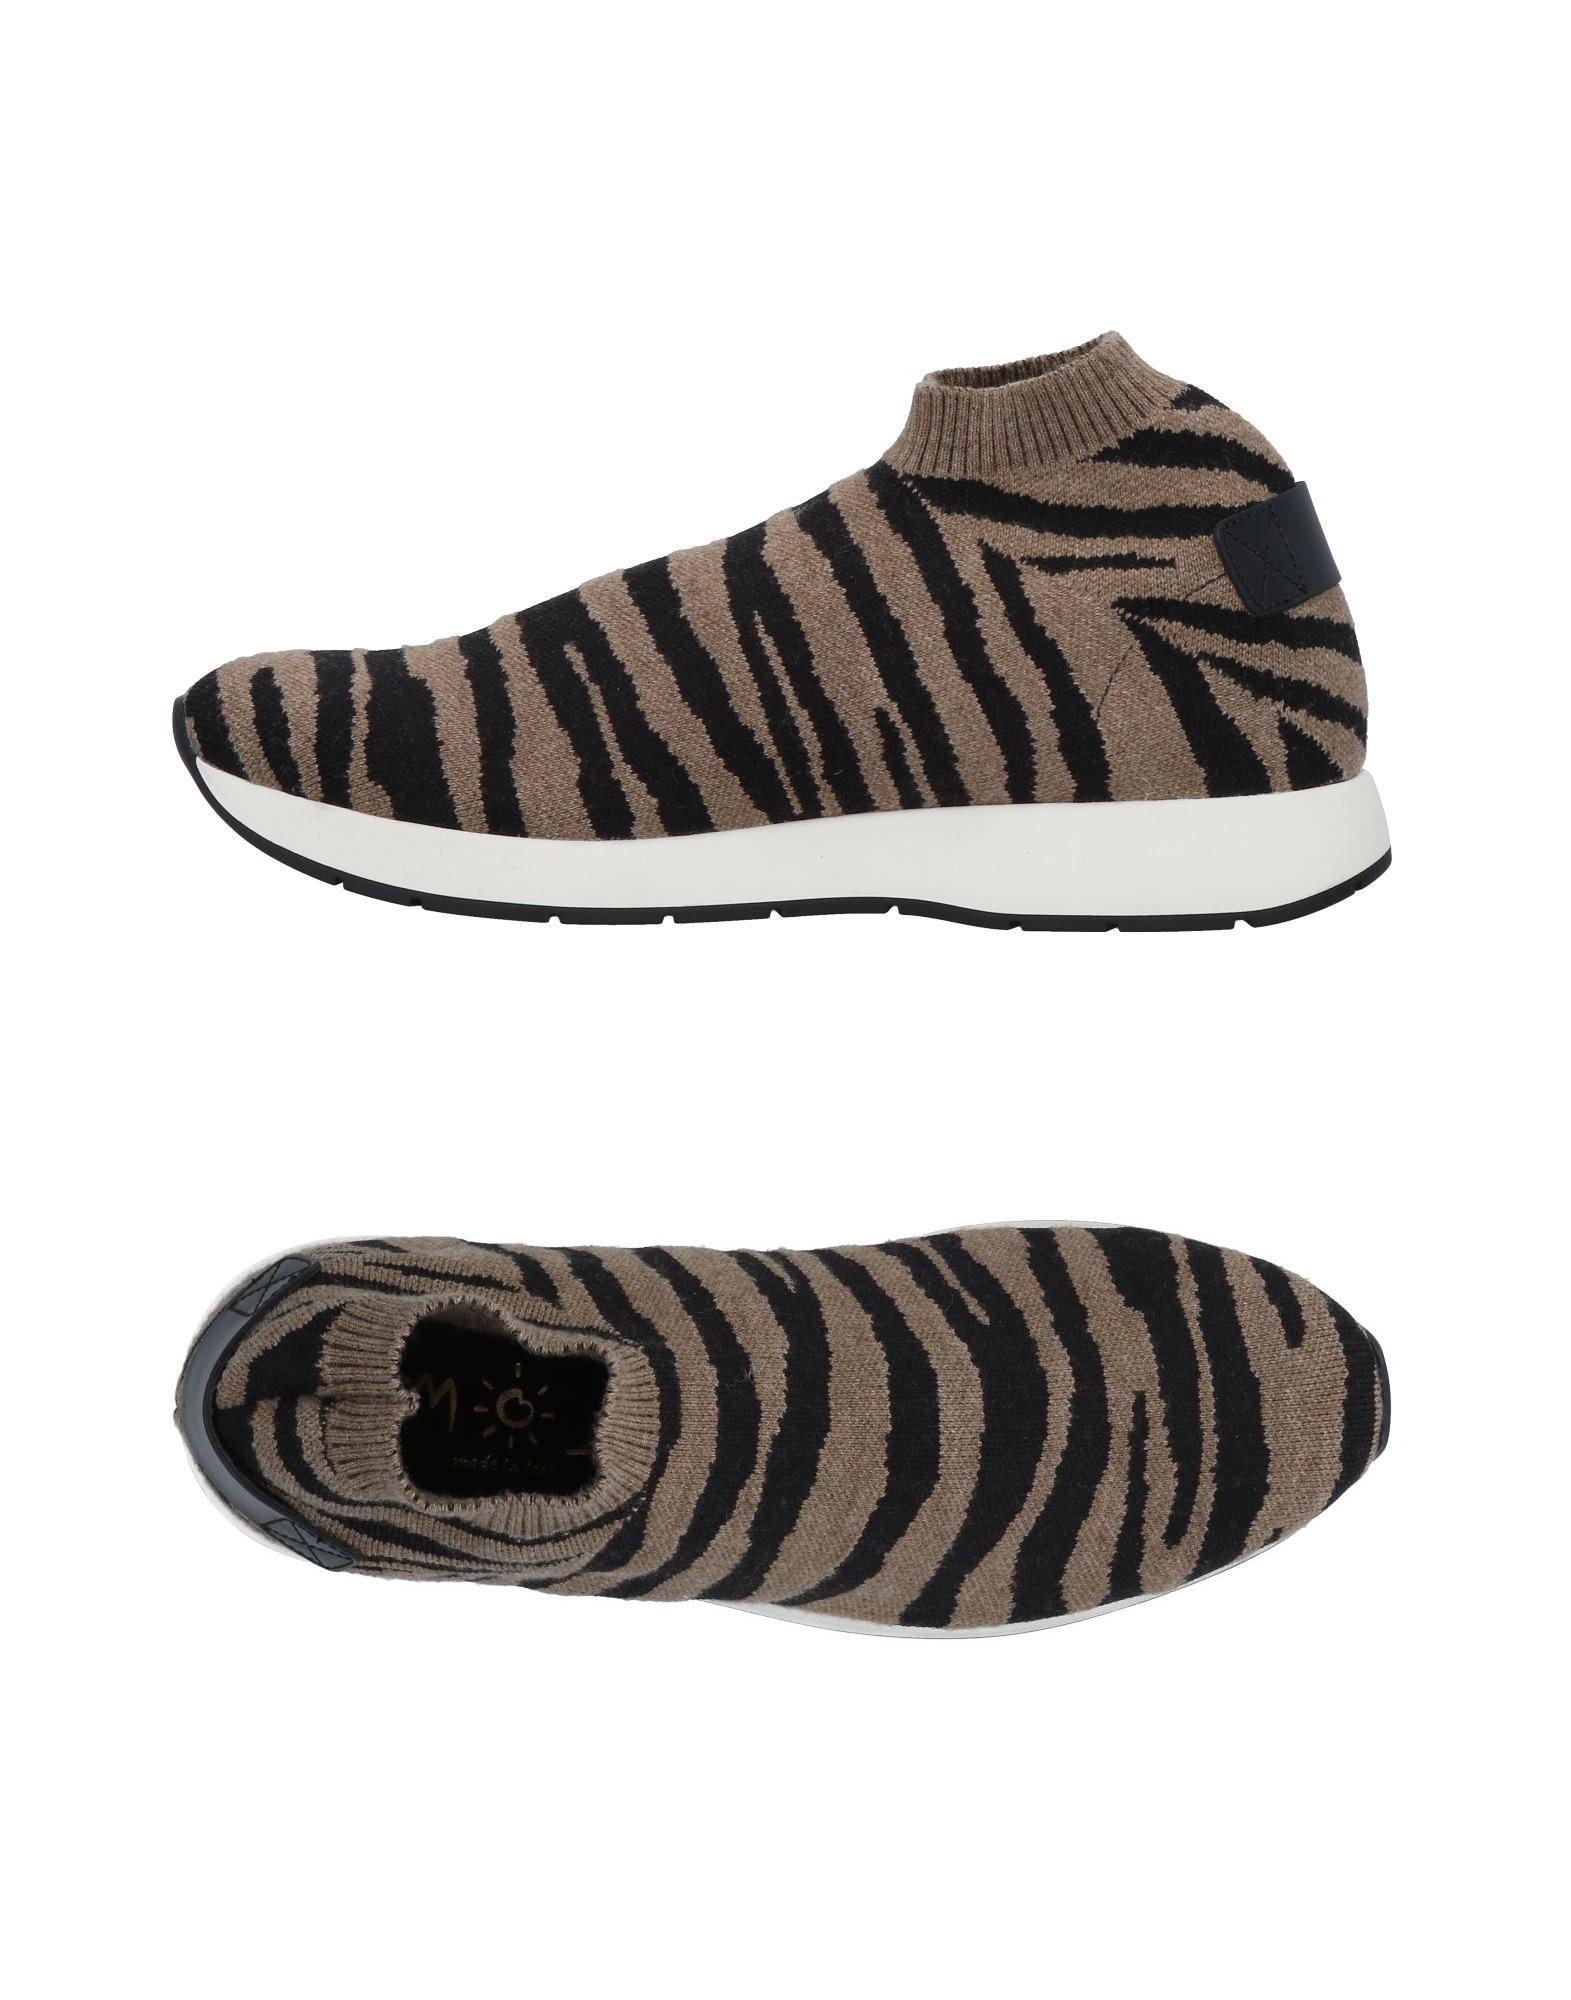 Sneakers Mos Donna - Acquista online su